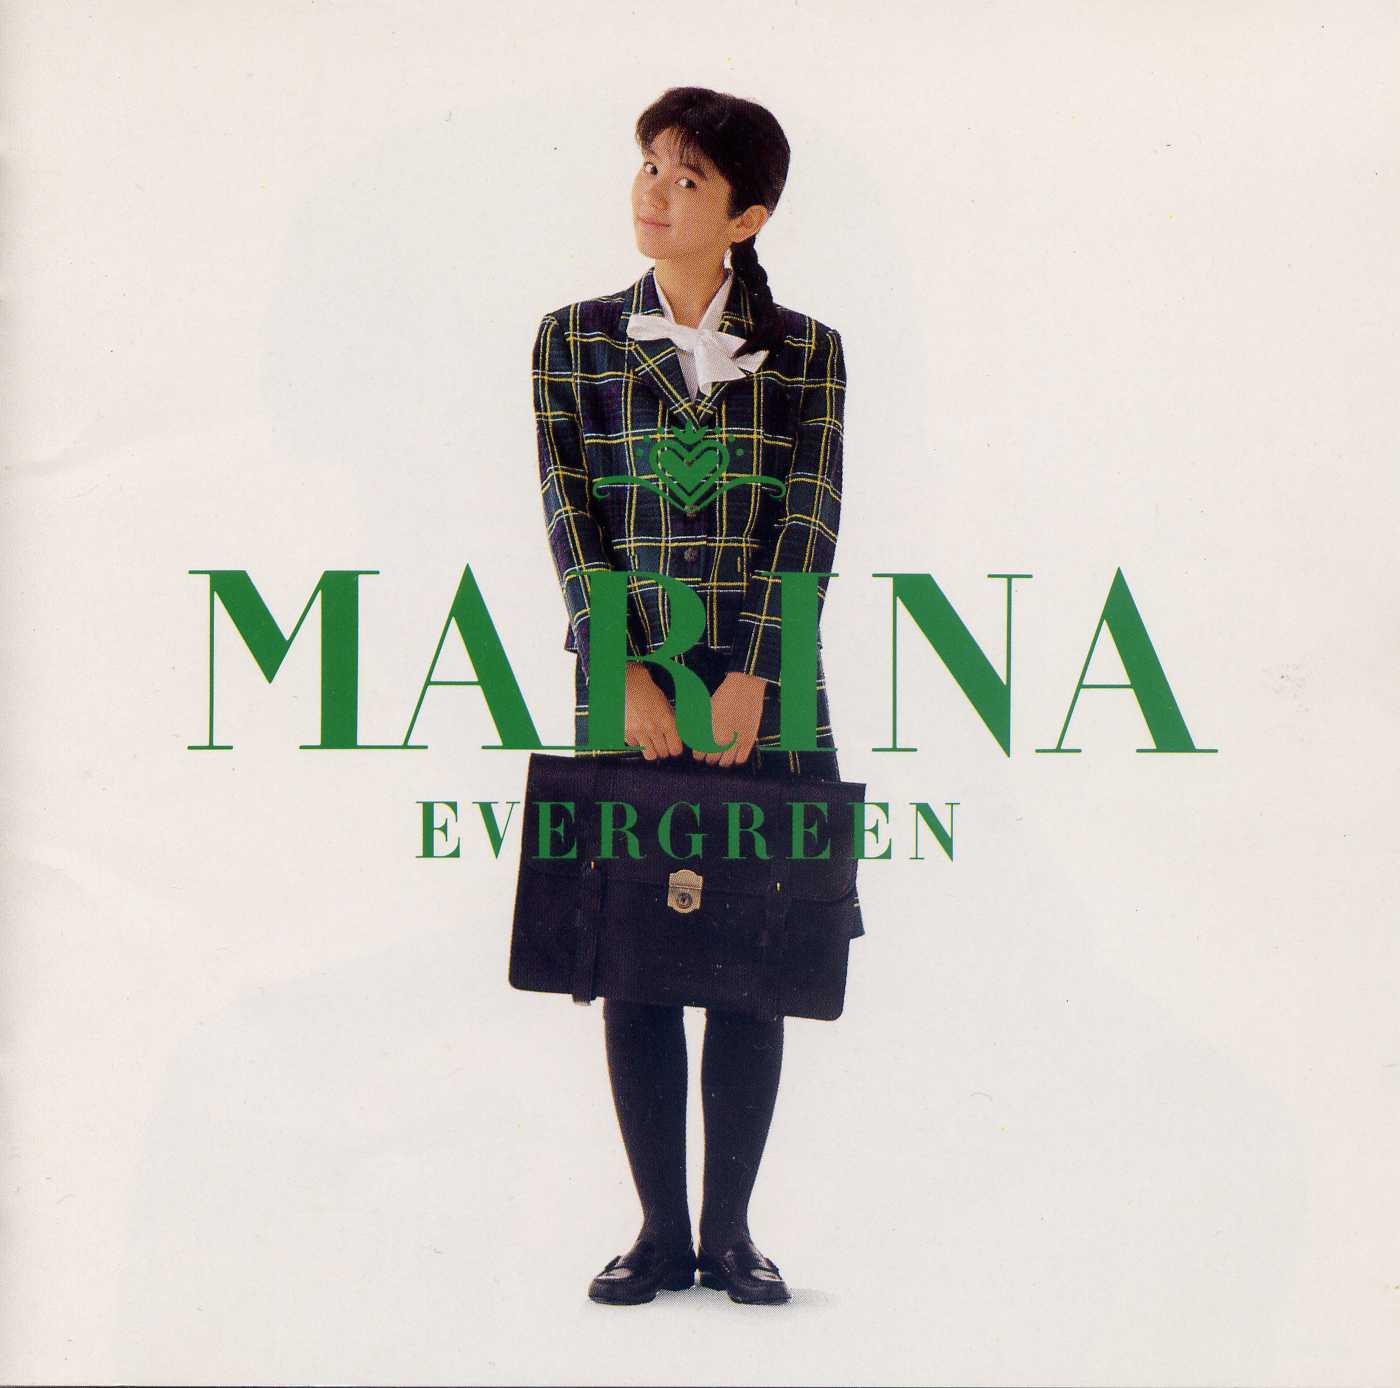 20160526.02.19 Marina Watanabe - Evergreen (1987) (M4A) cover.jpg